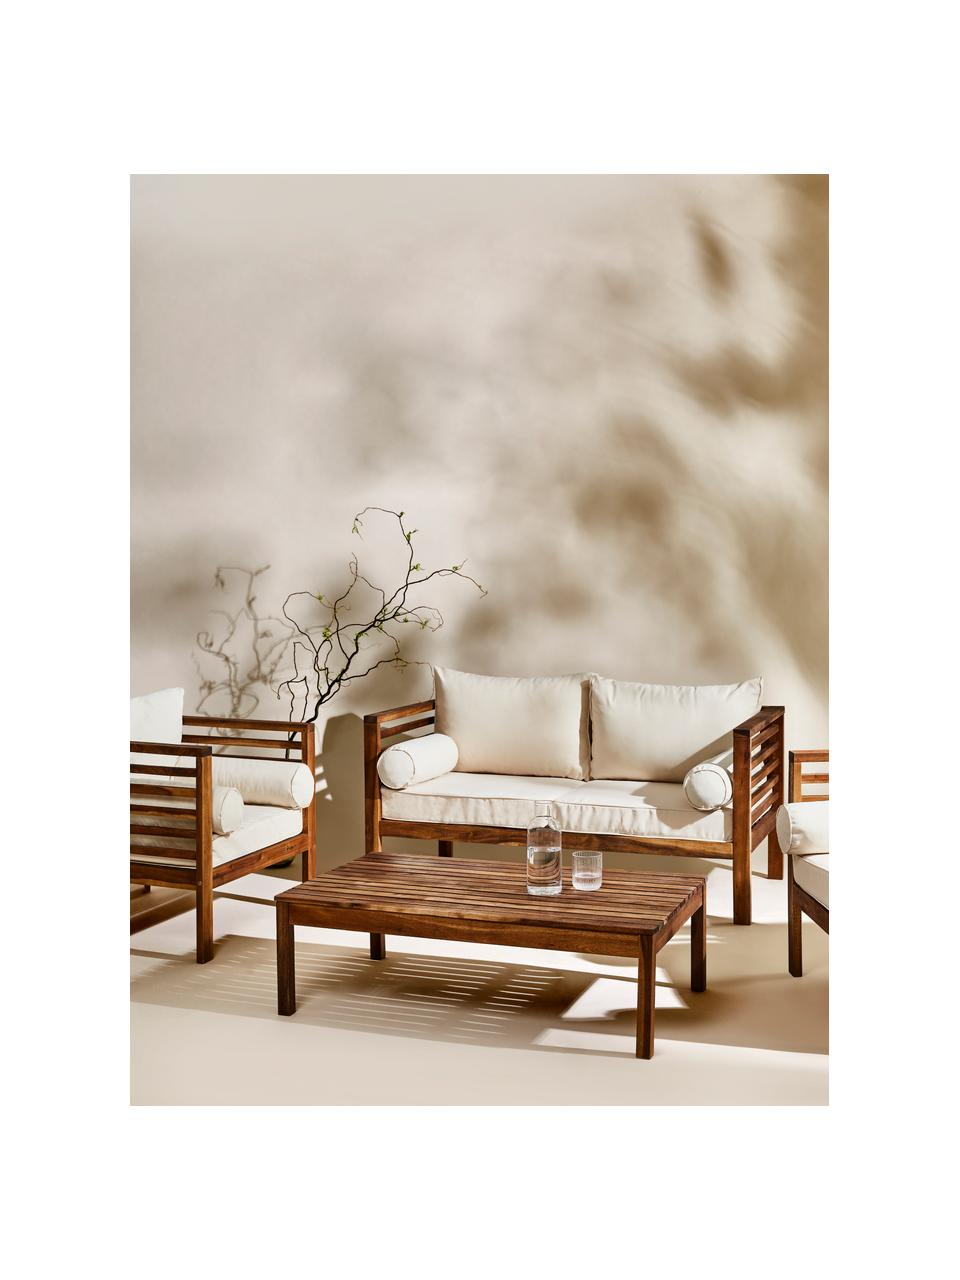 Garten-Lounge-Set Bo, 4-tlg., Gestell: Massives Akazienholz, geö, Bezüge: Beige, Gestelle: Akazienholz, Sondergrößen